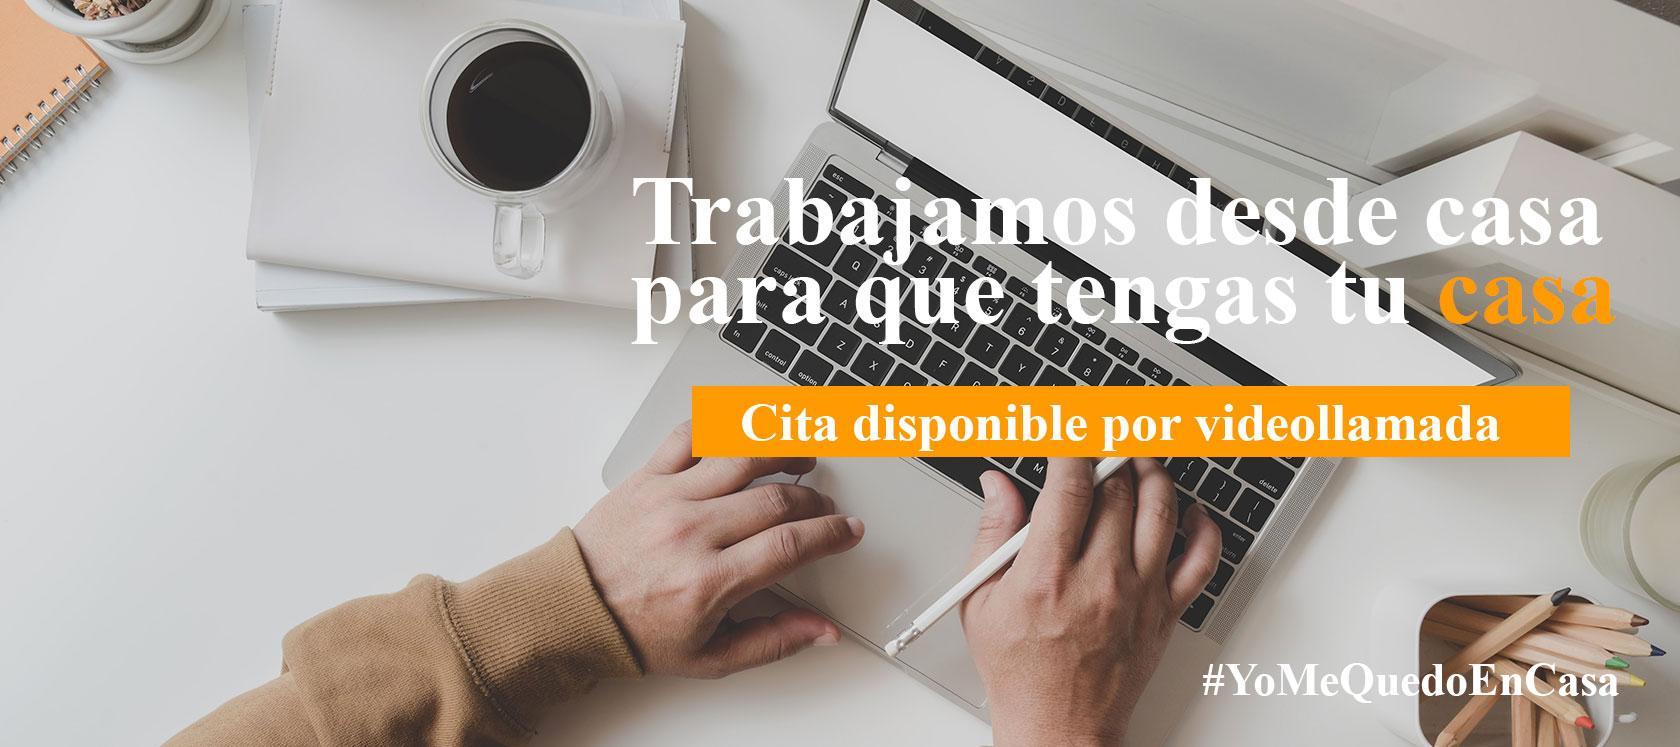 Obra Nueva Valencia Capital celere mt22